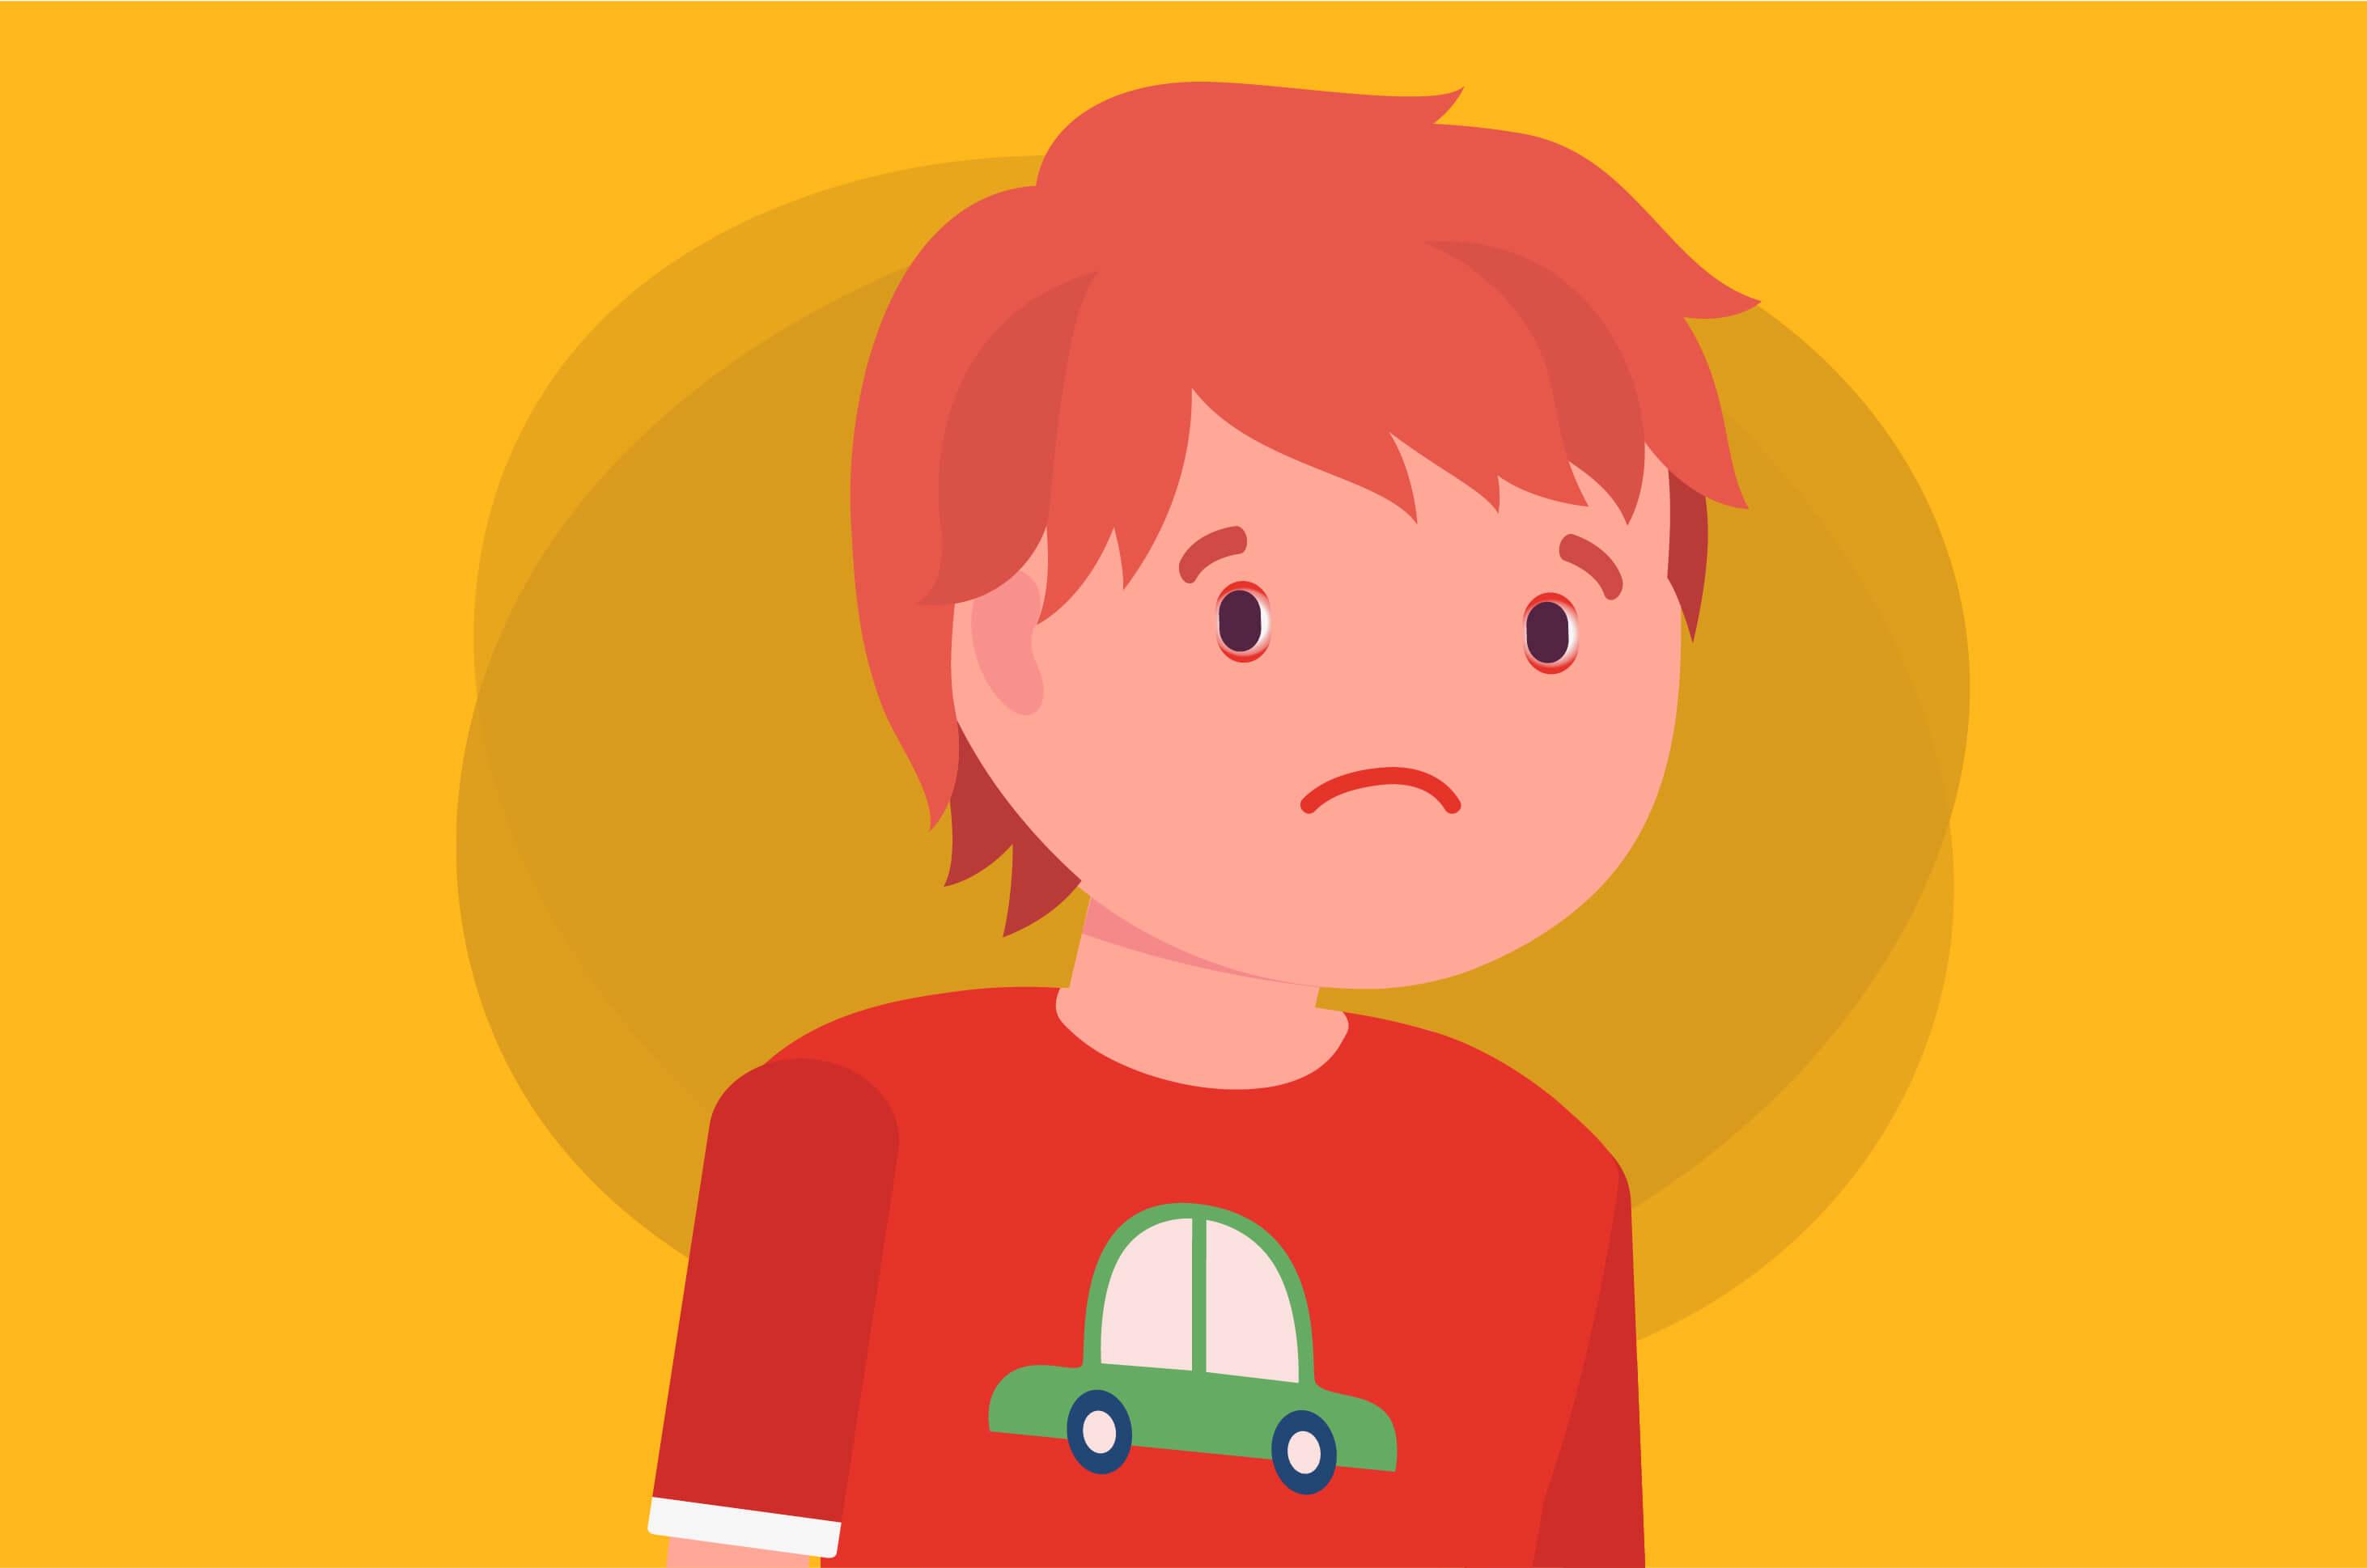 Ketahui Gejala Perdarahan Subkonjungtiva pada Anak